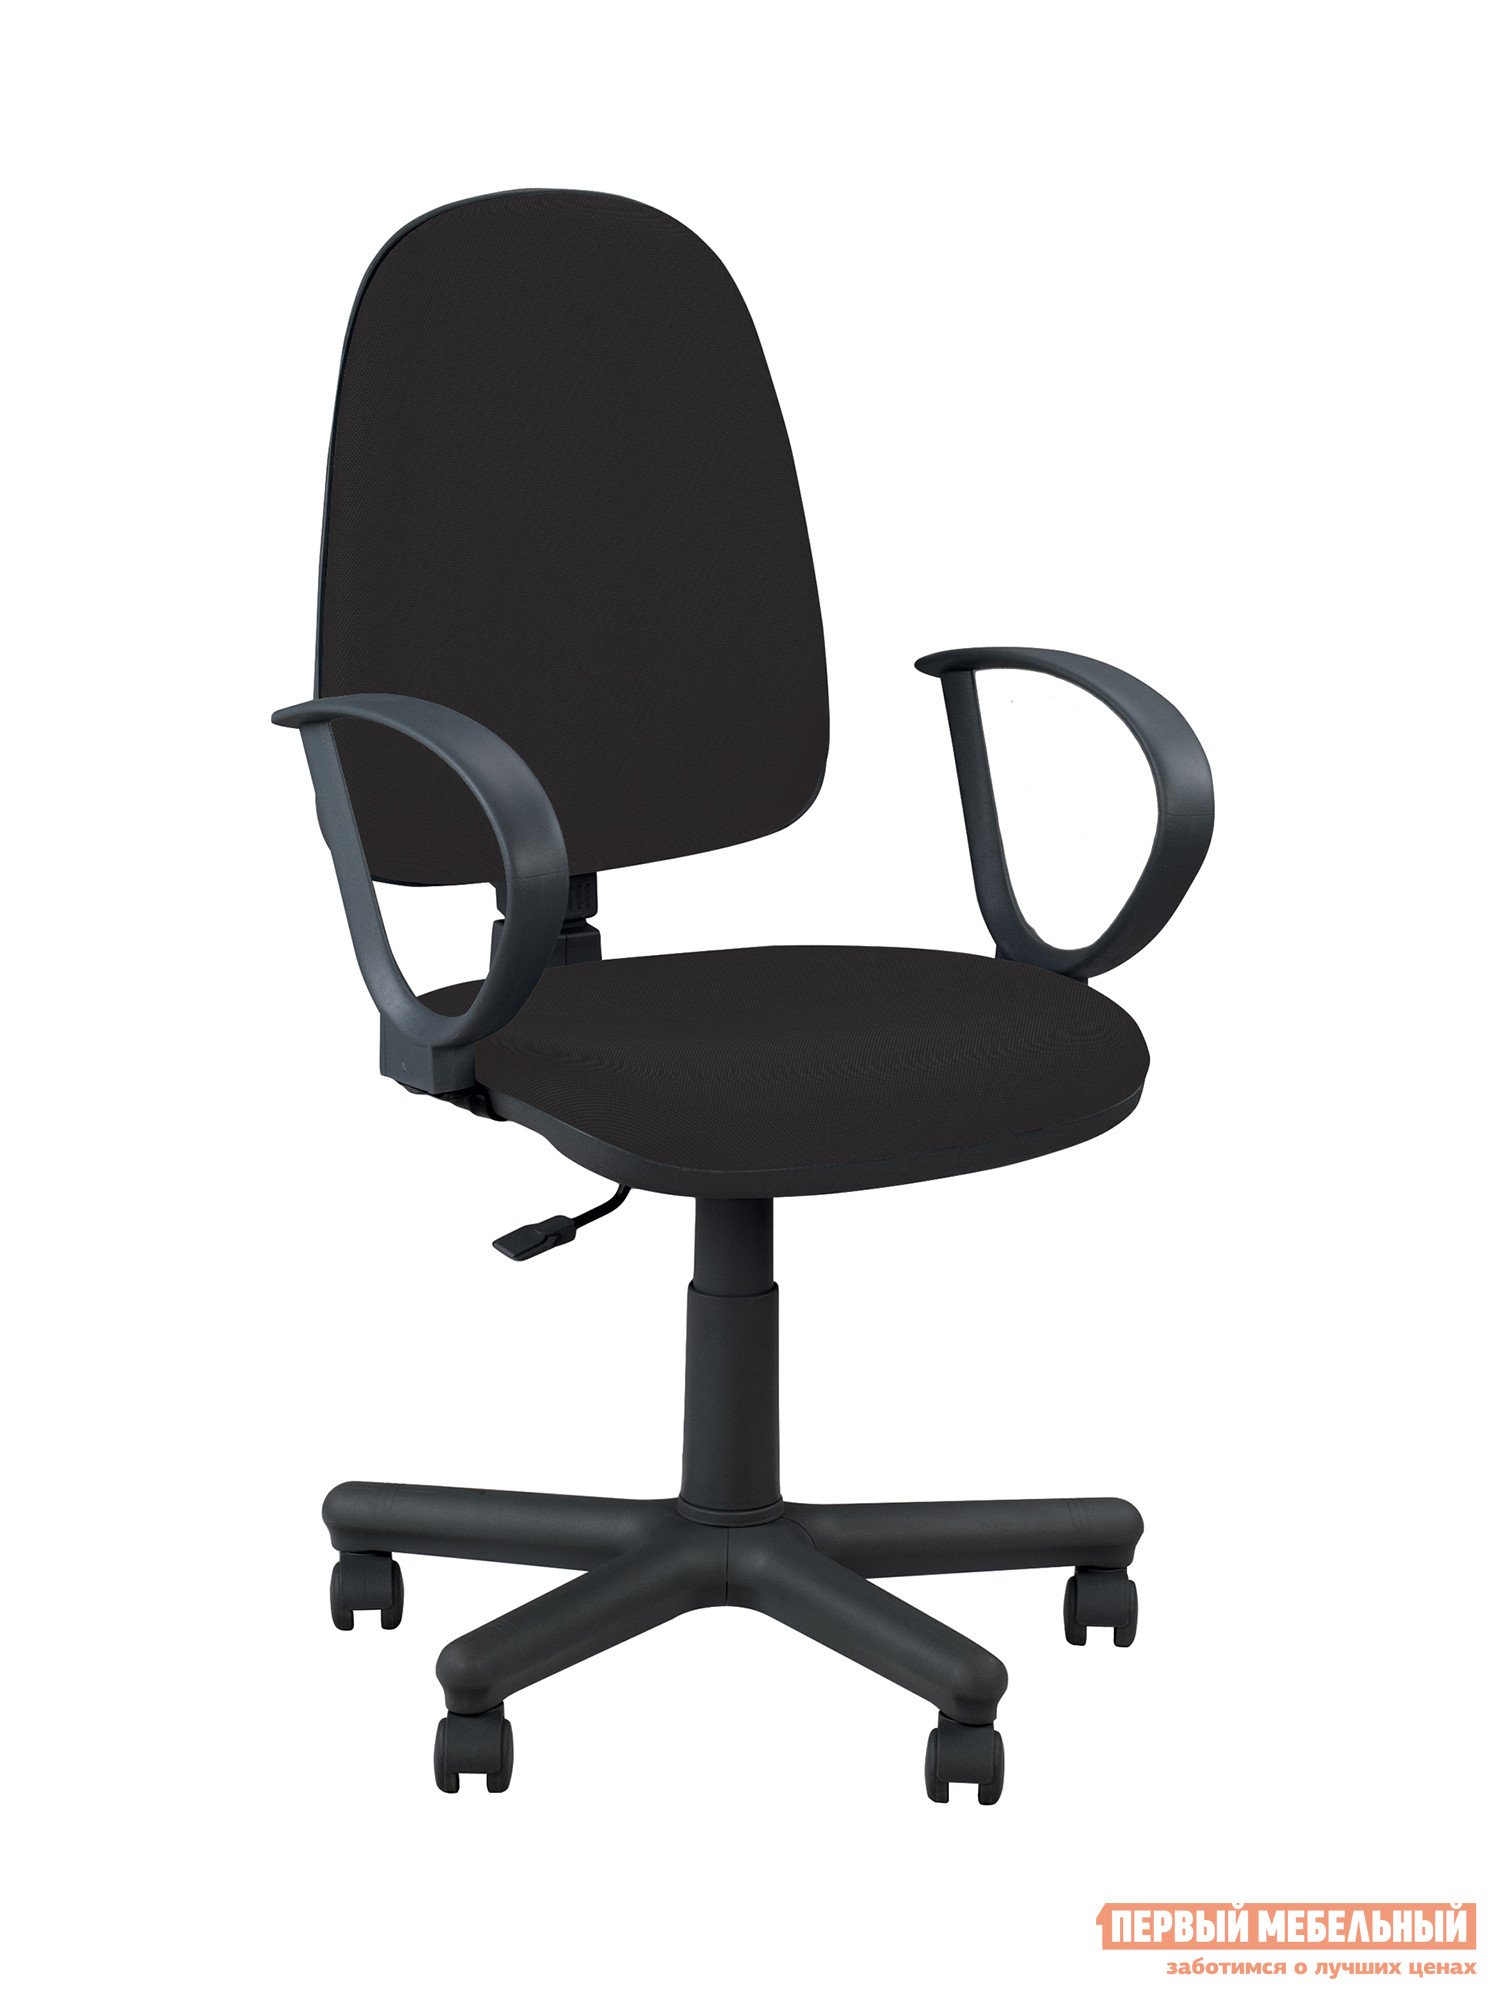 Офисное кресло NOWYSTYL JUPITER GTP CPT PM60  Черная С-11 ткань